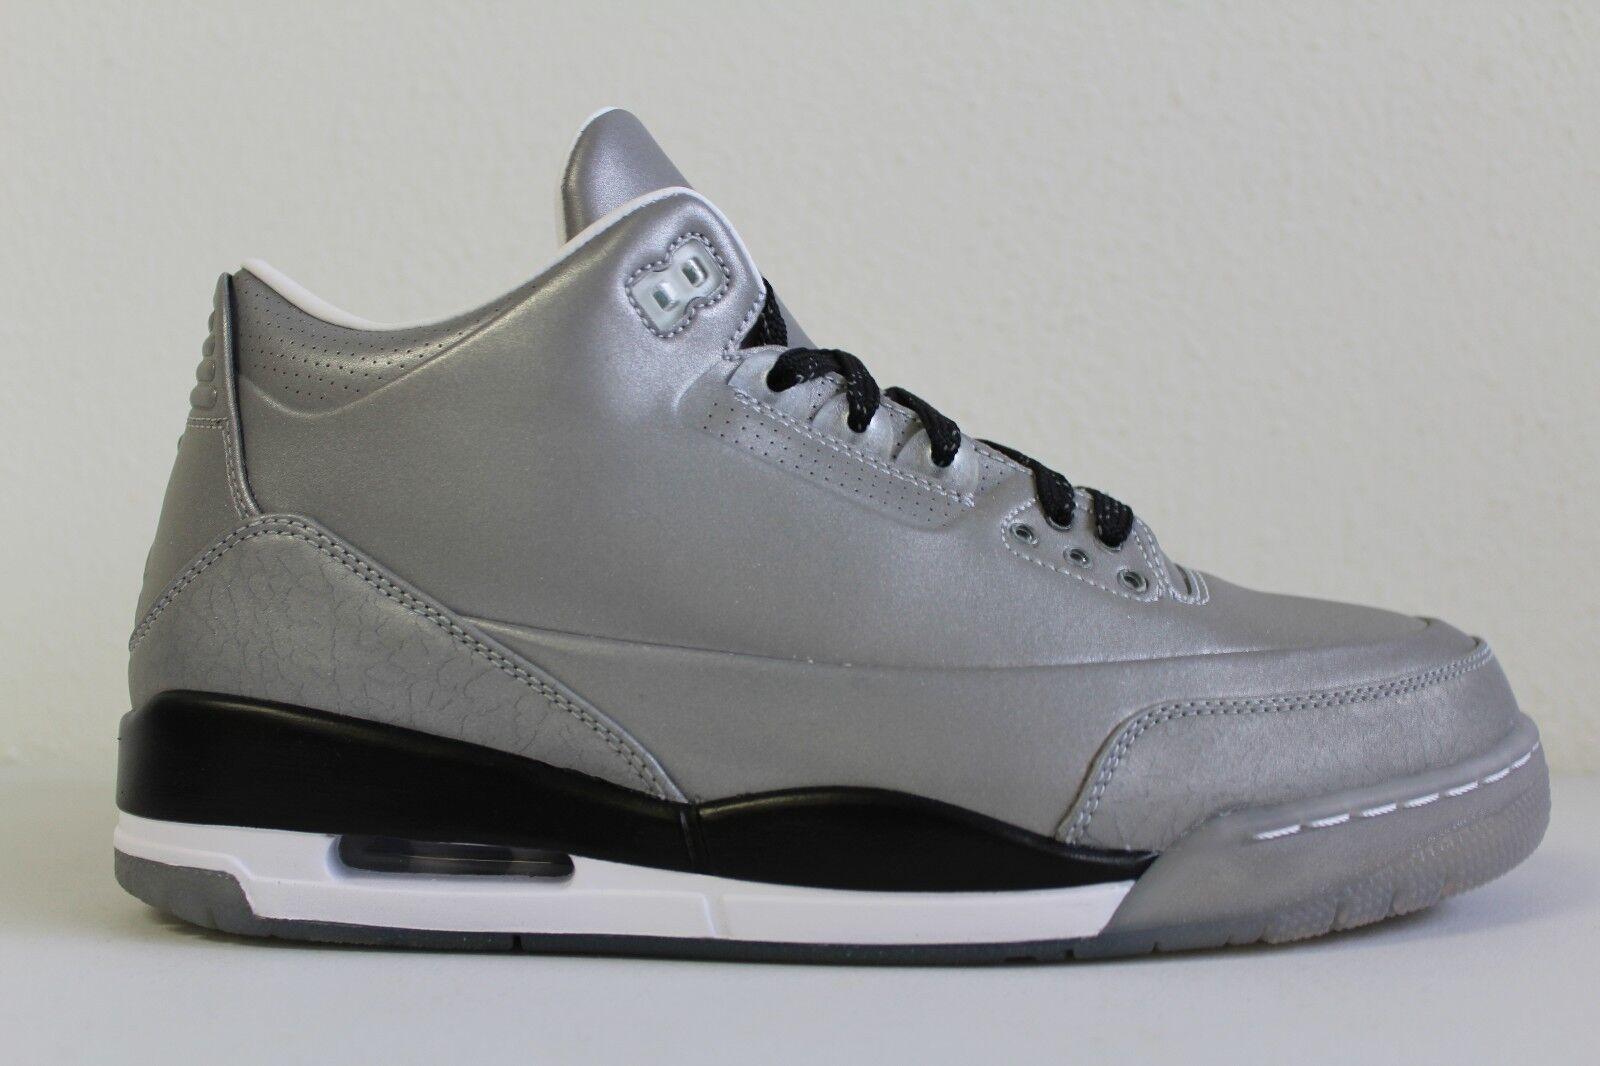 Nike Mens Air Jordan III 3 Retro 5LAB3 SILVER 3M Reflective 631603 003 Size 9.5